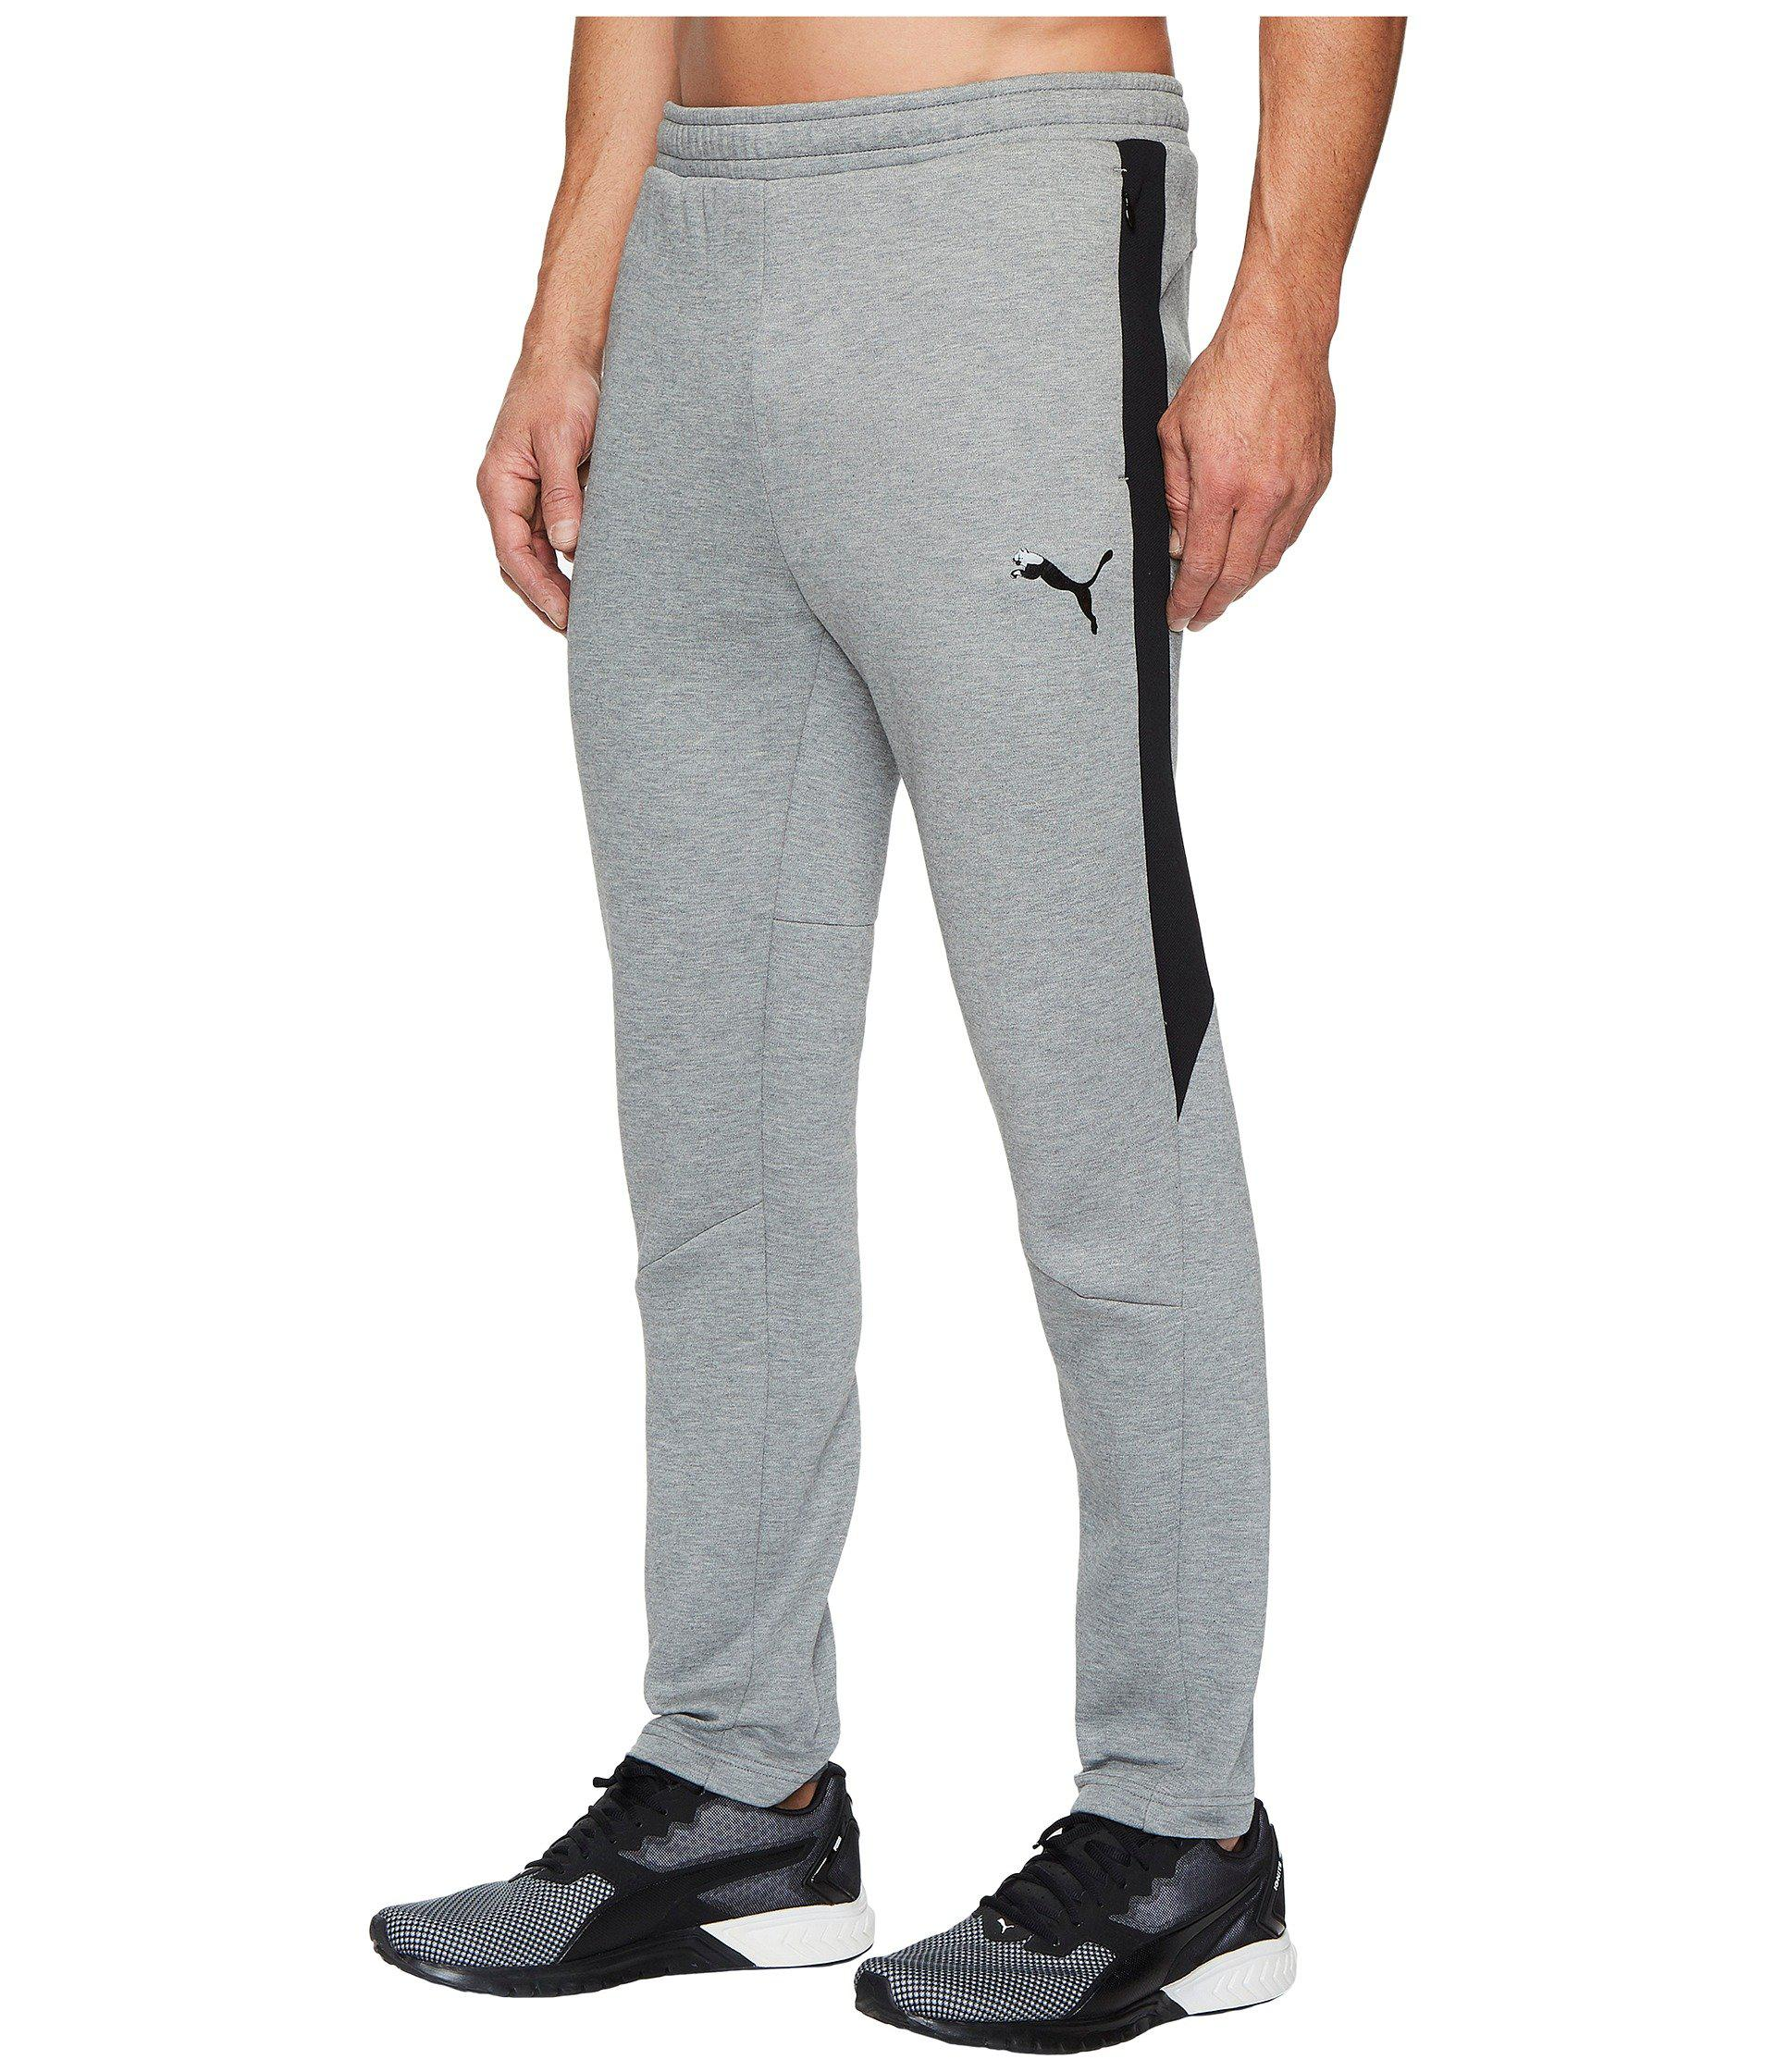 37a31fe43 Fitness Clothing & Accessories Grey Puma Evostripe Move Mens Joggers